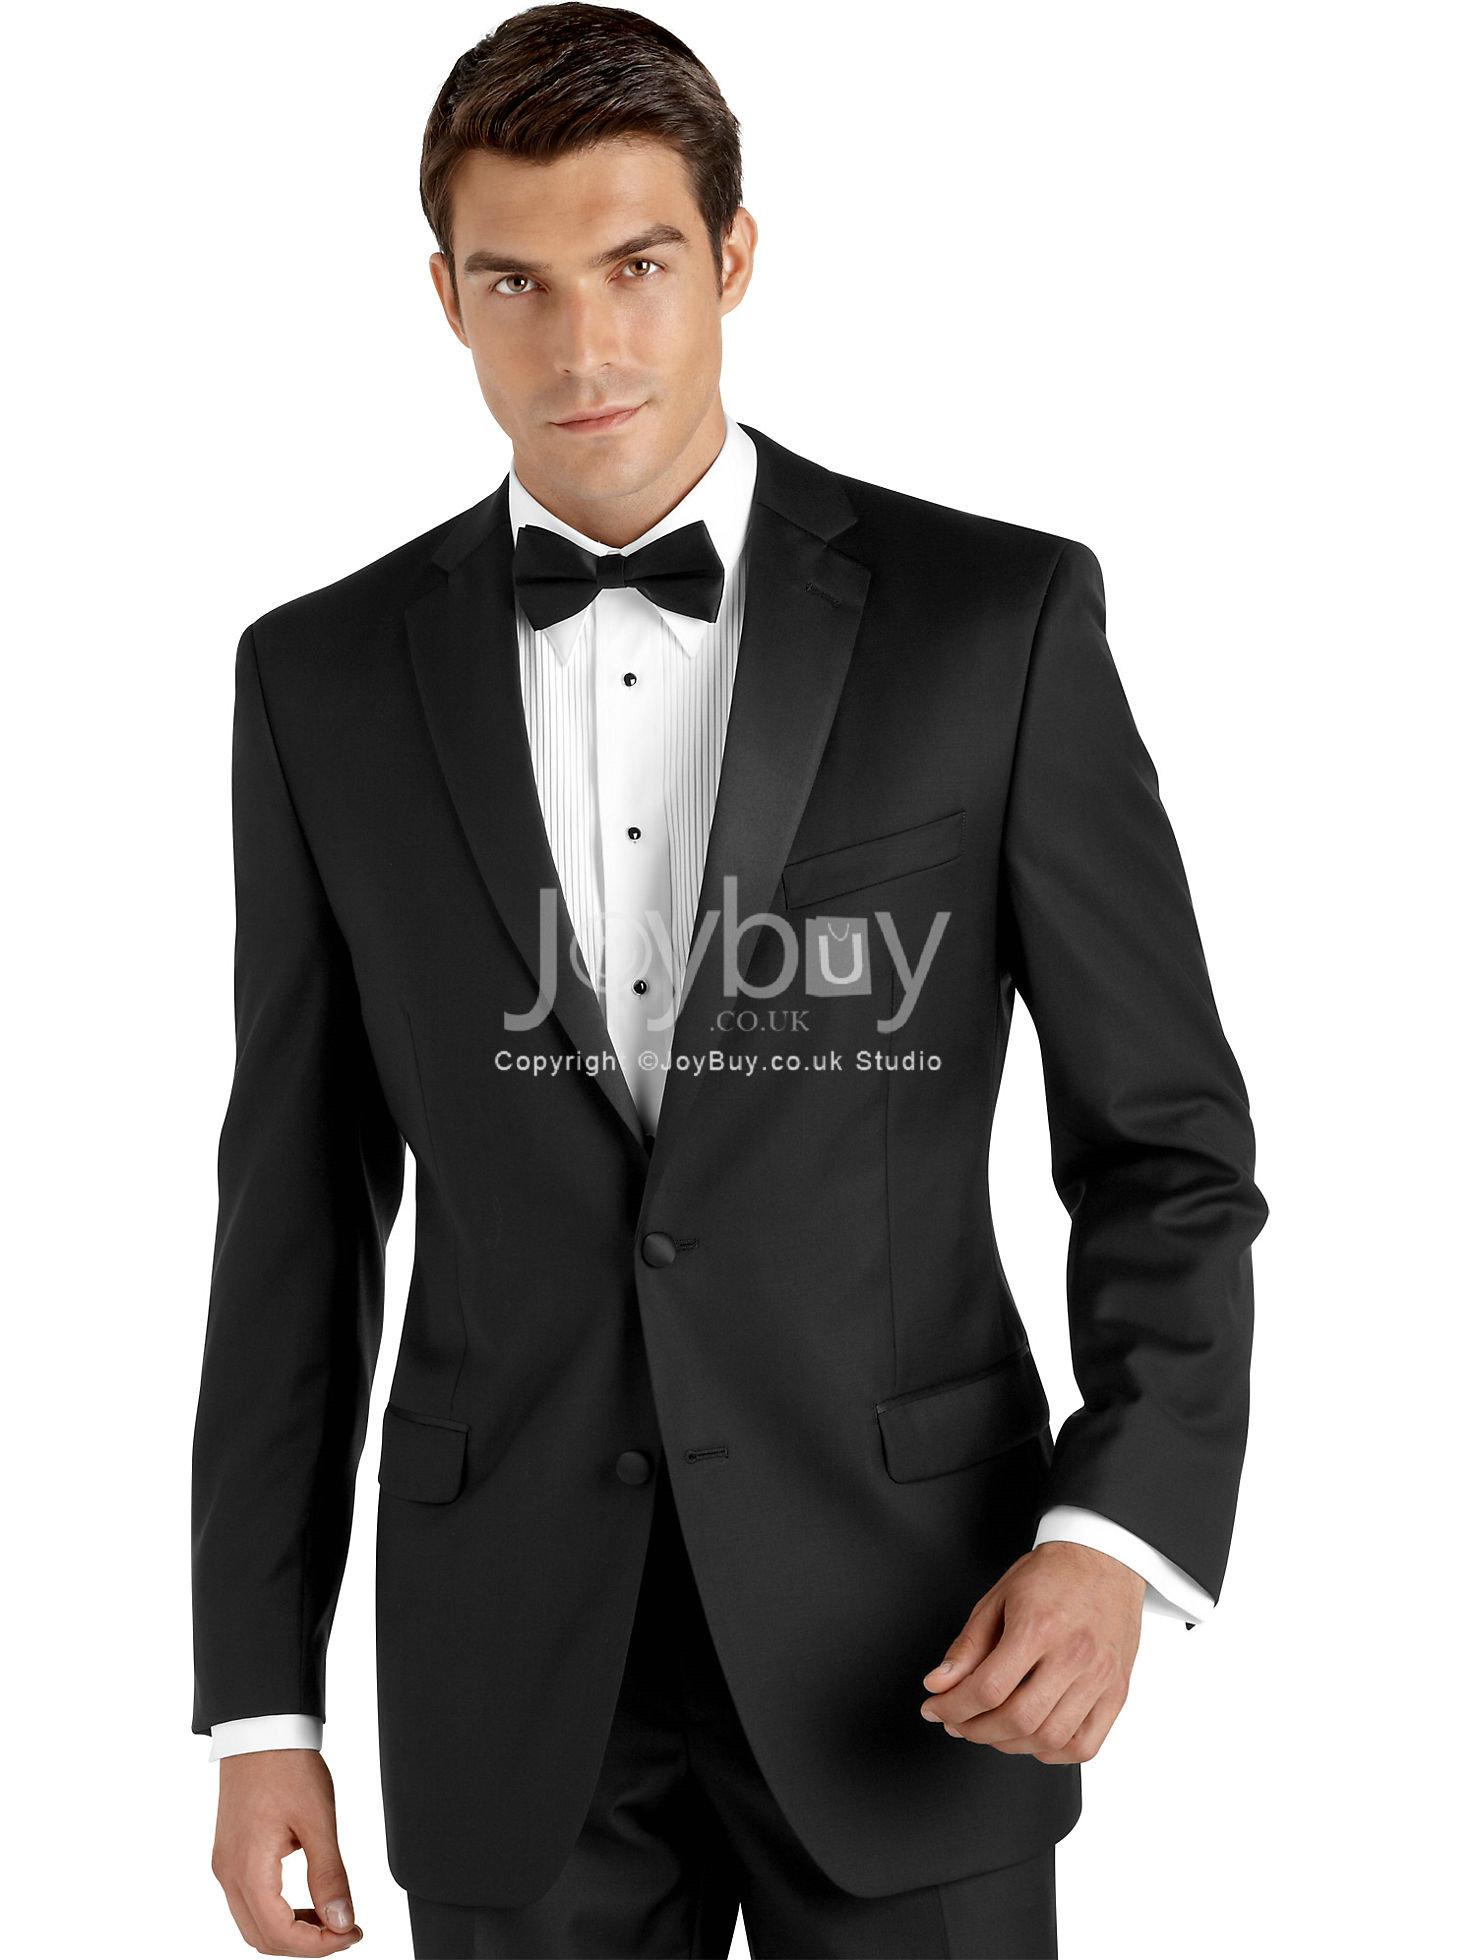 Groom wear for weddings - Fashion Ki Batain  Groom wear for ...